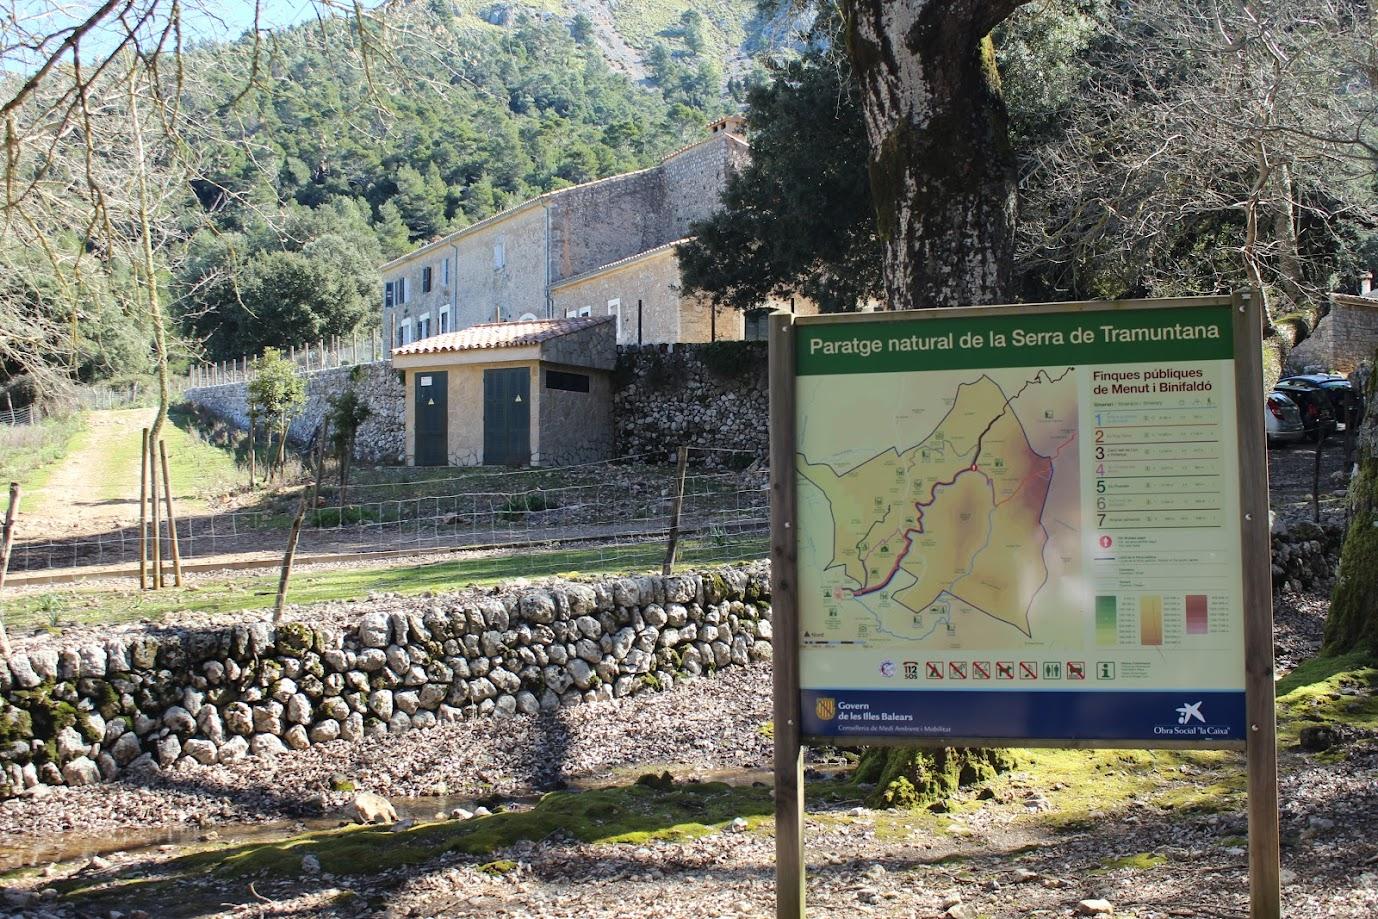 Fincas públicas Menut y Binifaldó. Cova de Muntanya. -Foto: Rafael Minguillón -BTTersMallorca